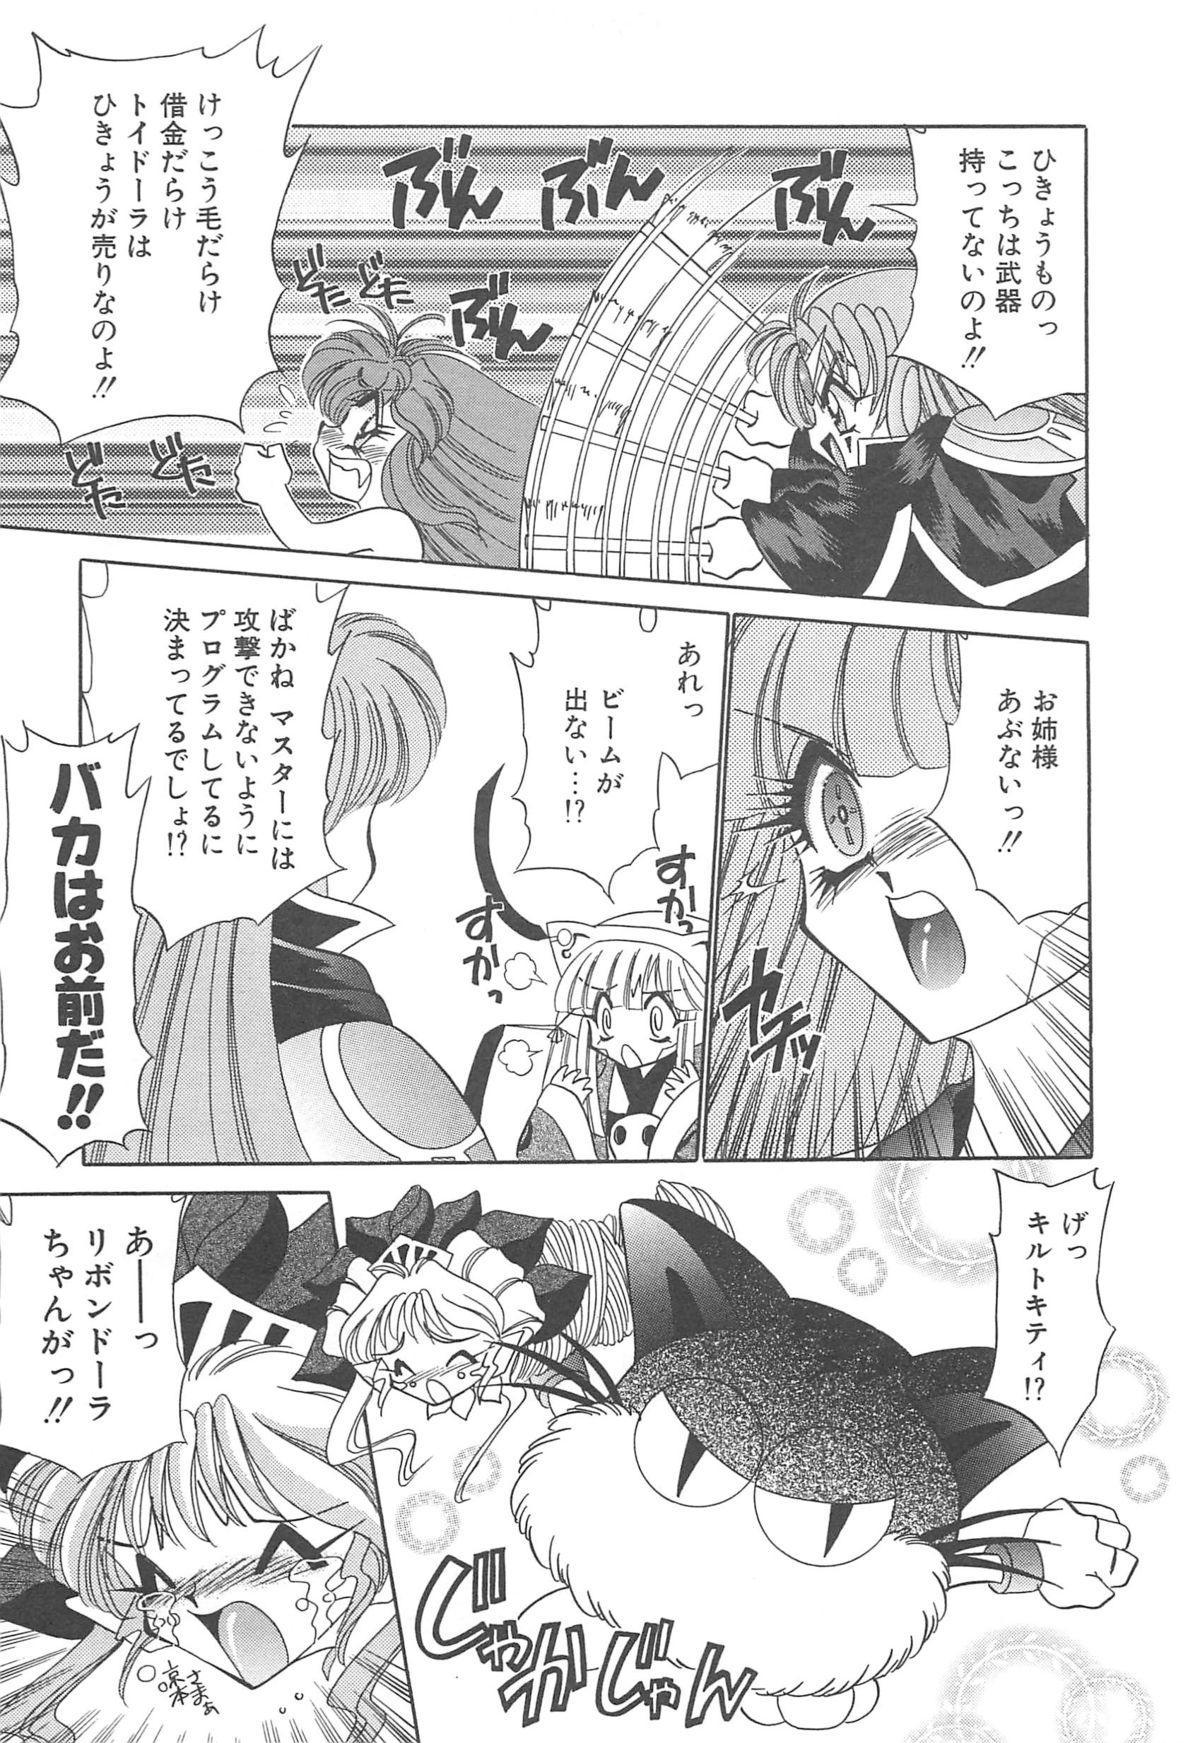 Kigurumi Sentai Quiltian 159